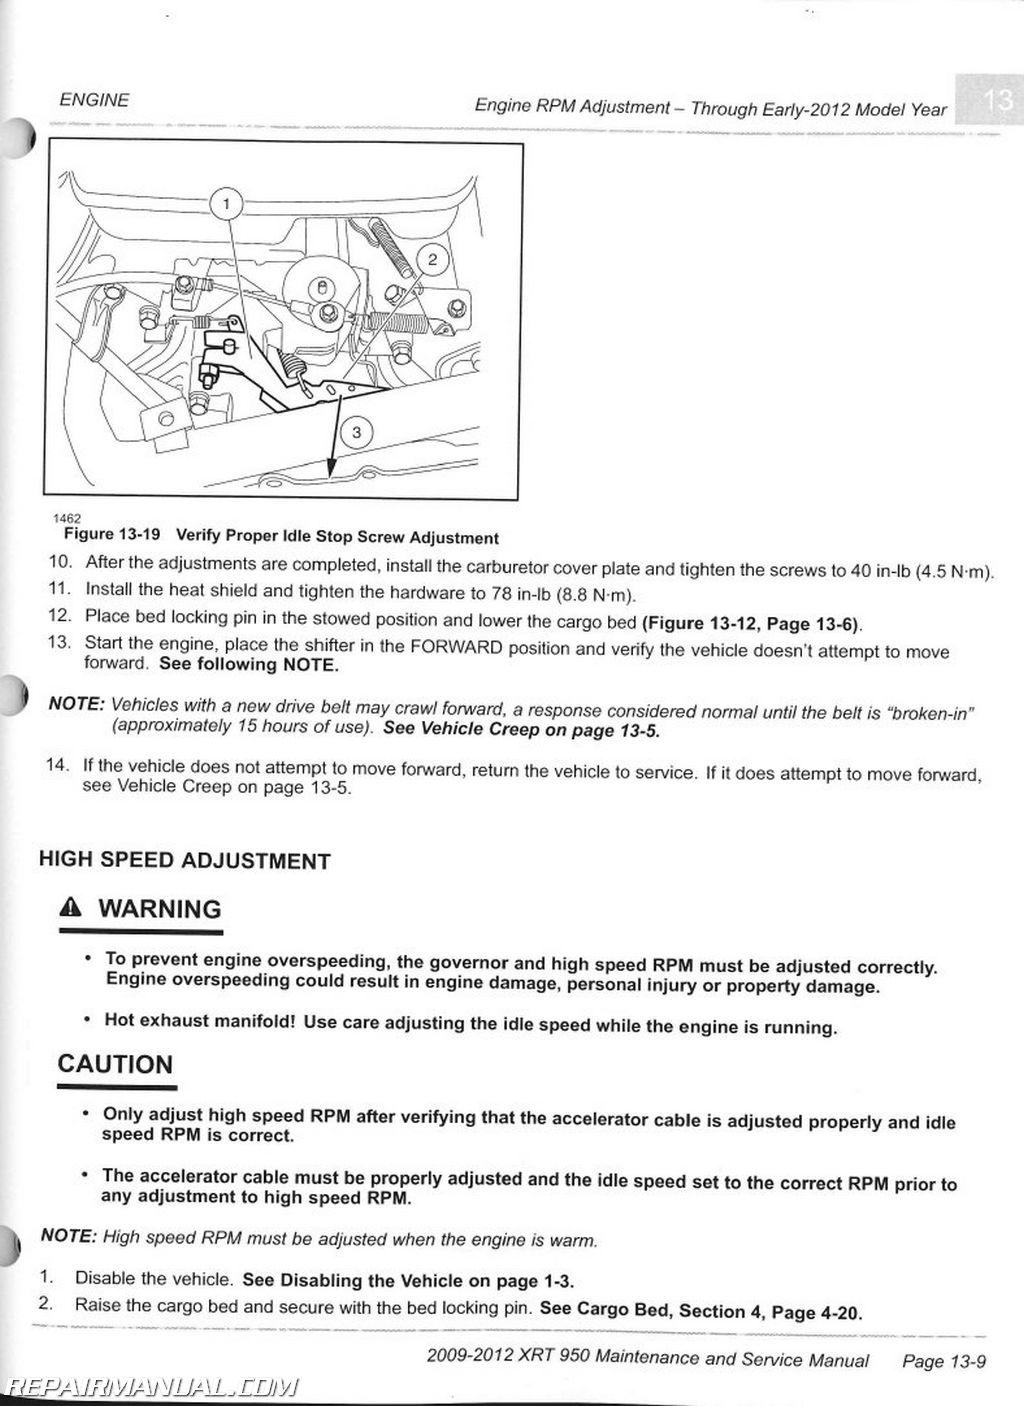 Wiring Diagram Club Car Xrt 800 Trusted Diagrams Gas On Engine Schematic 850